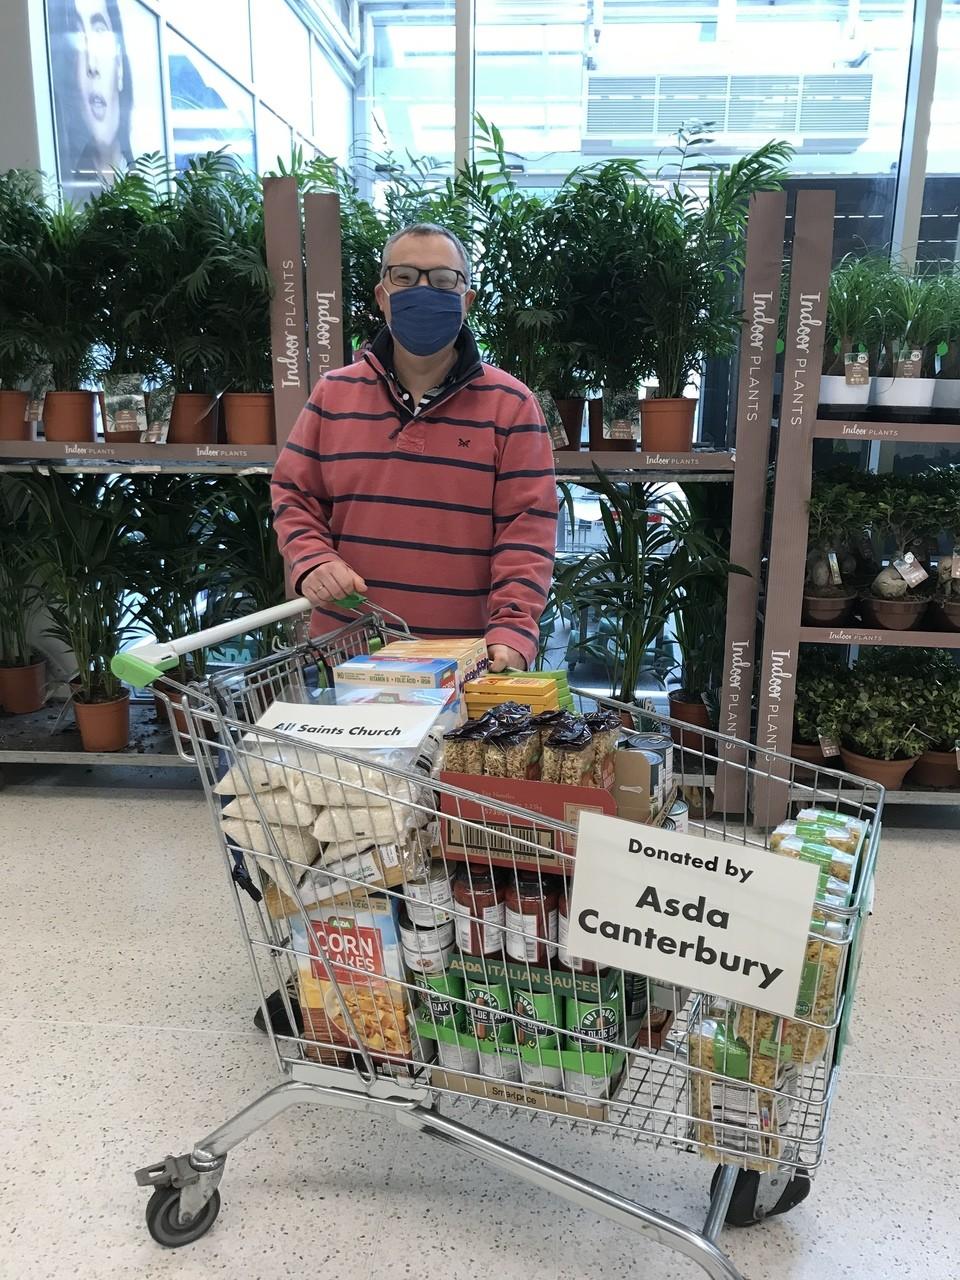 Donation to community food pantry.  | Asda Canterbury